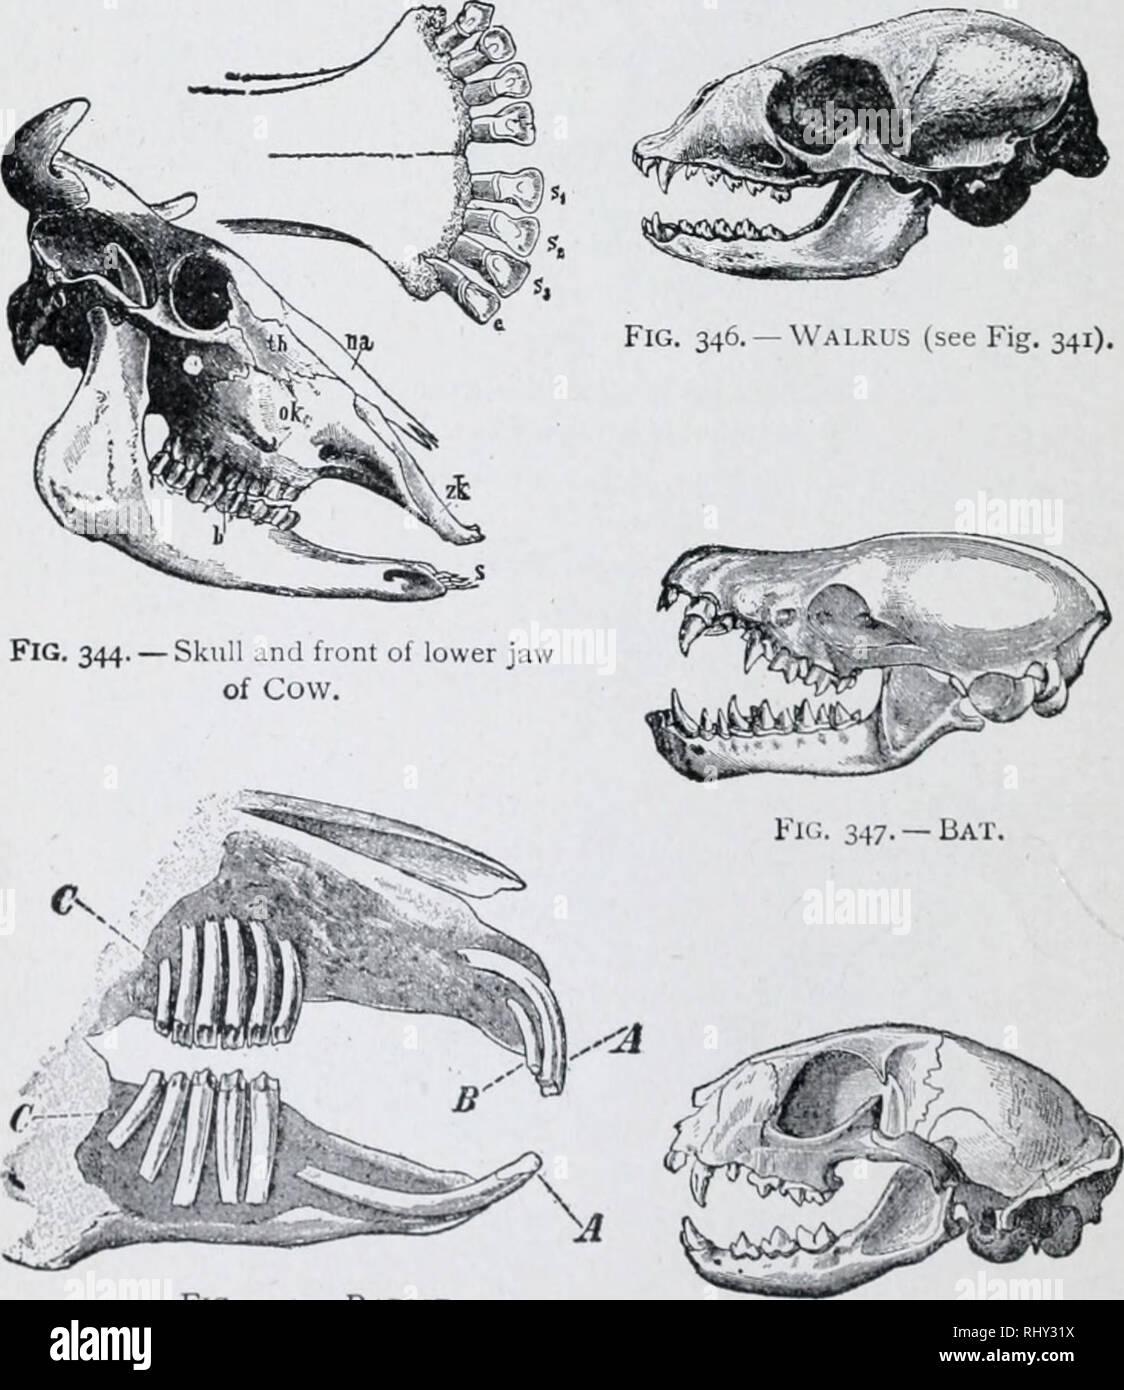 hight resolution of 1 94 chart of mammalian skulls illustrated study man s dental formula is 5 32 in like manner fill out formulas below cow 1 c 2 32 rabbit